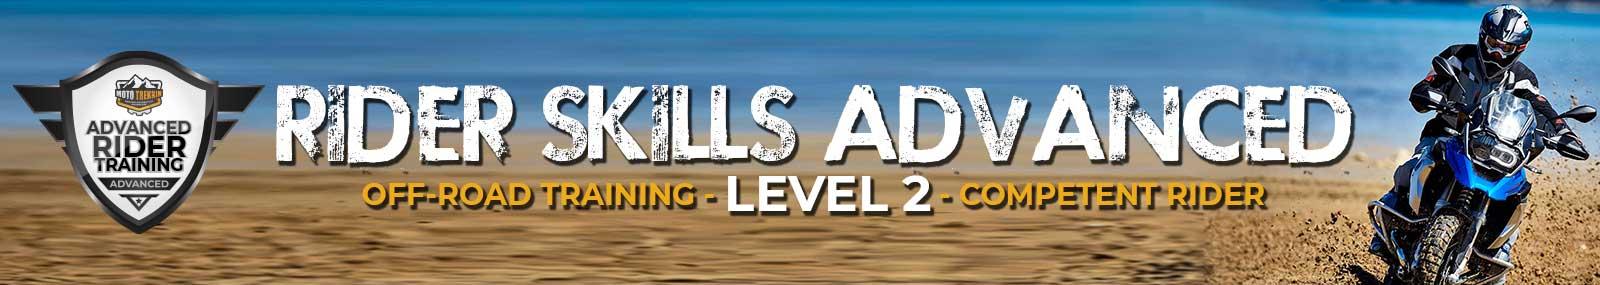 Advanced Rider Training 2020